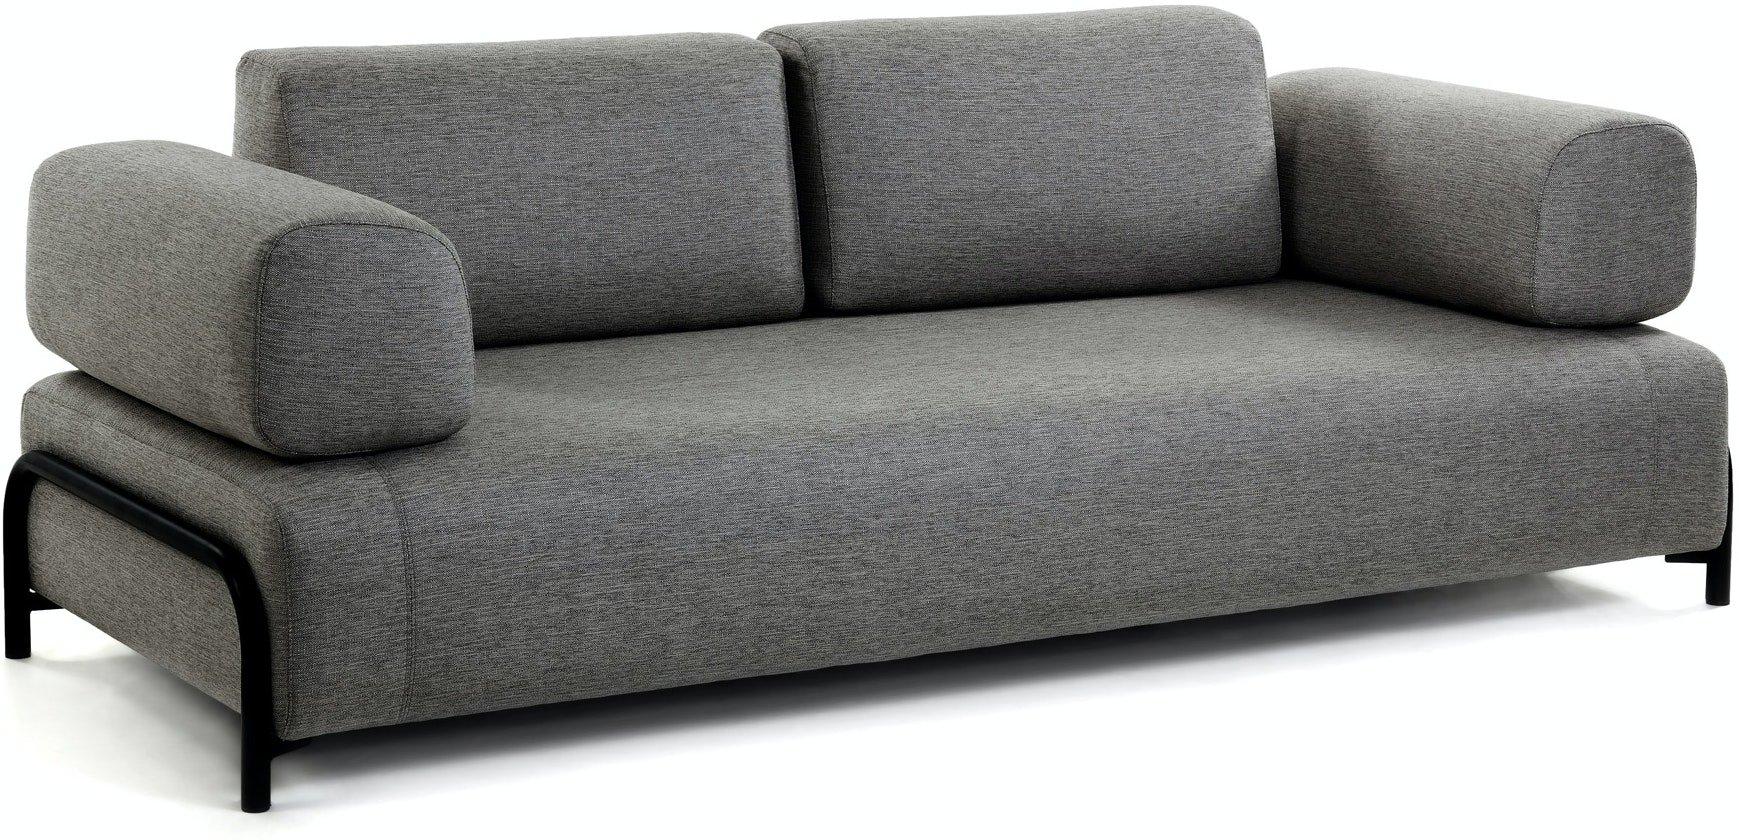 Compo, 3-personers sofa by LaForma (Armlæn v/h, Sort)